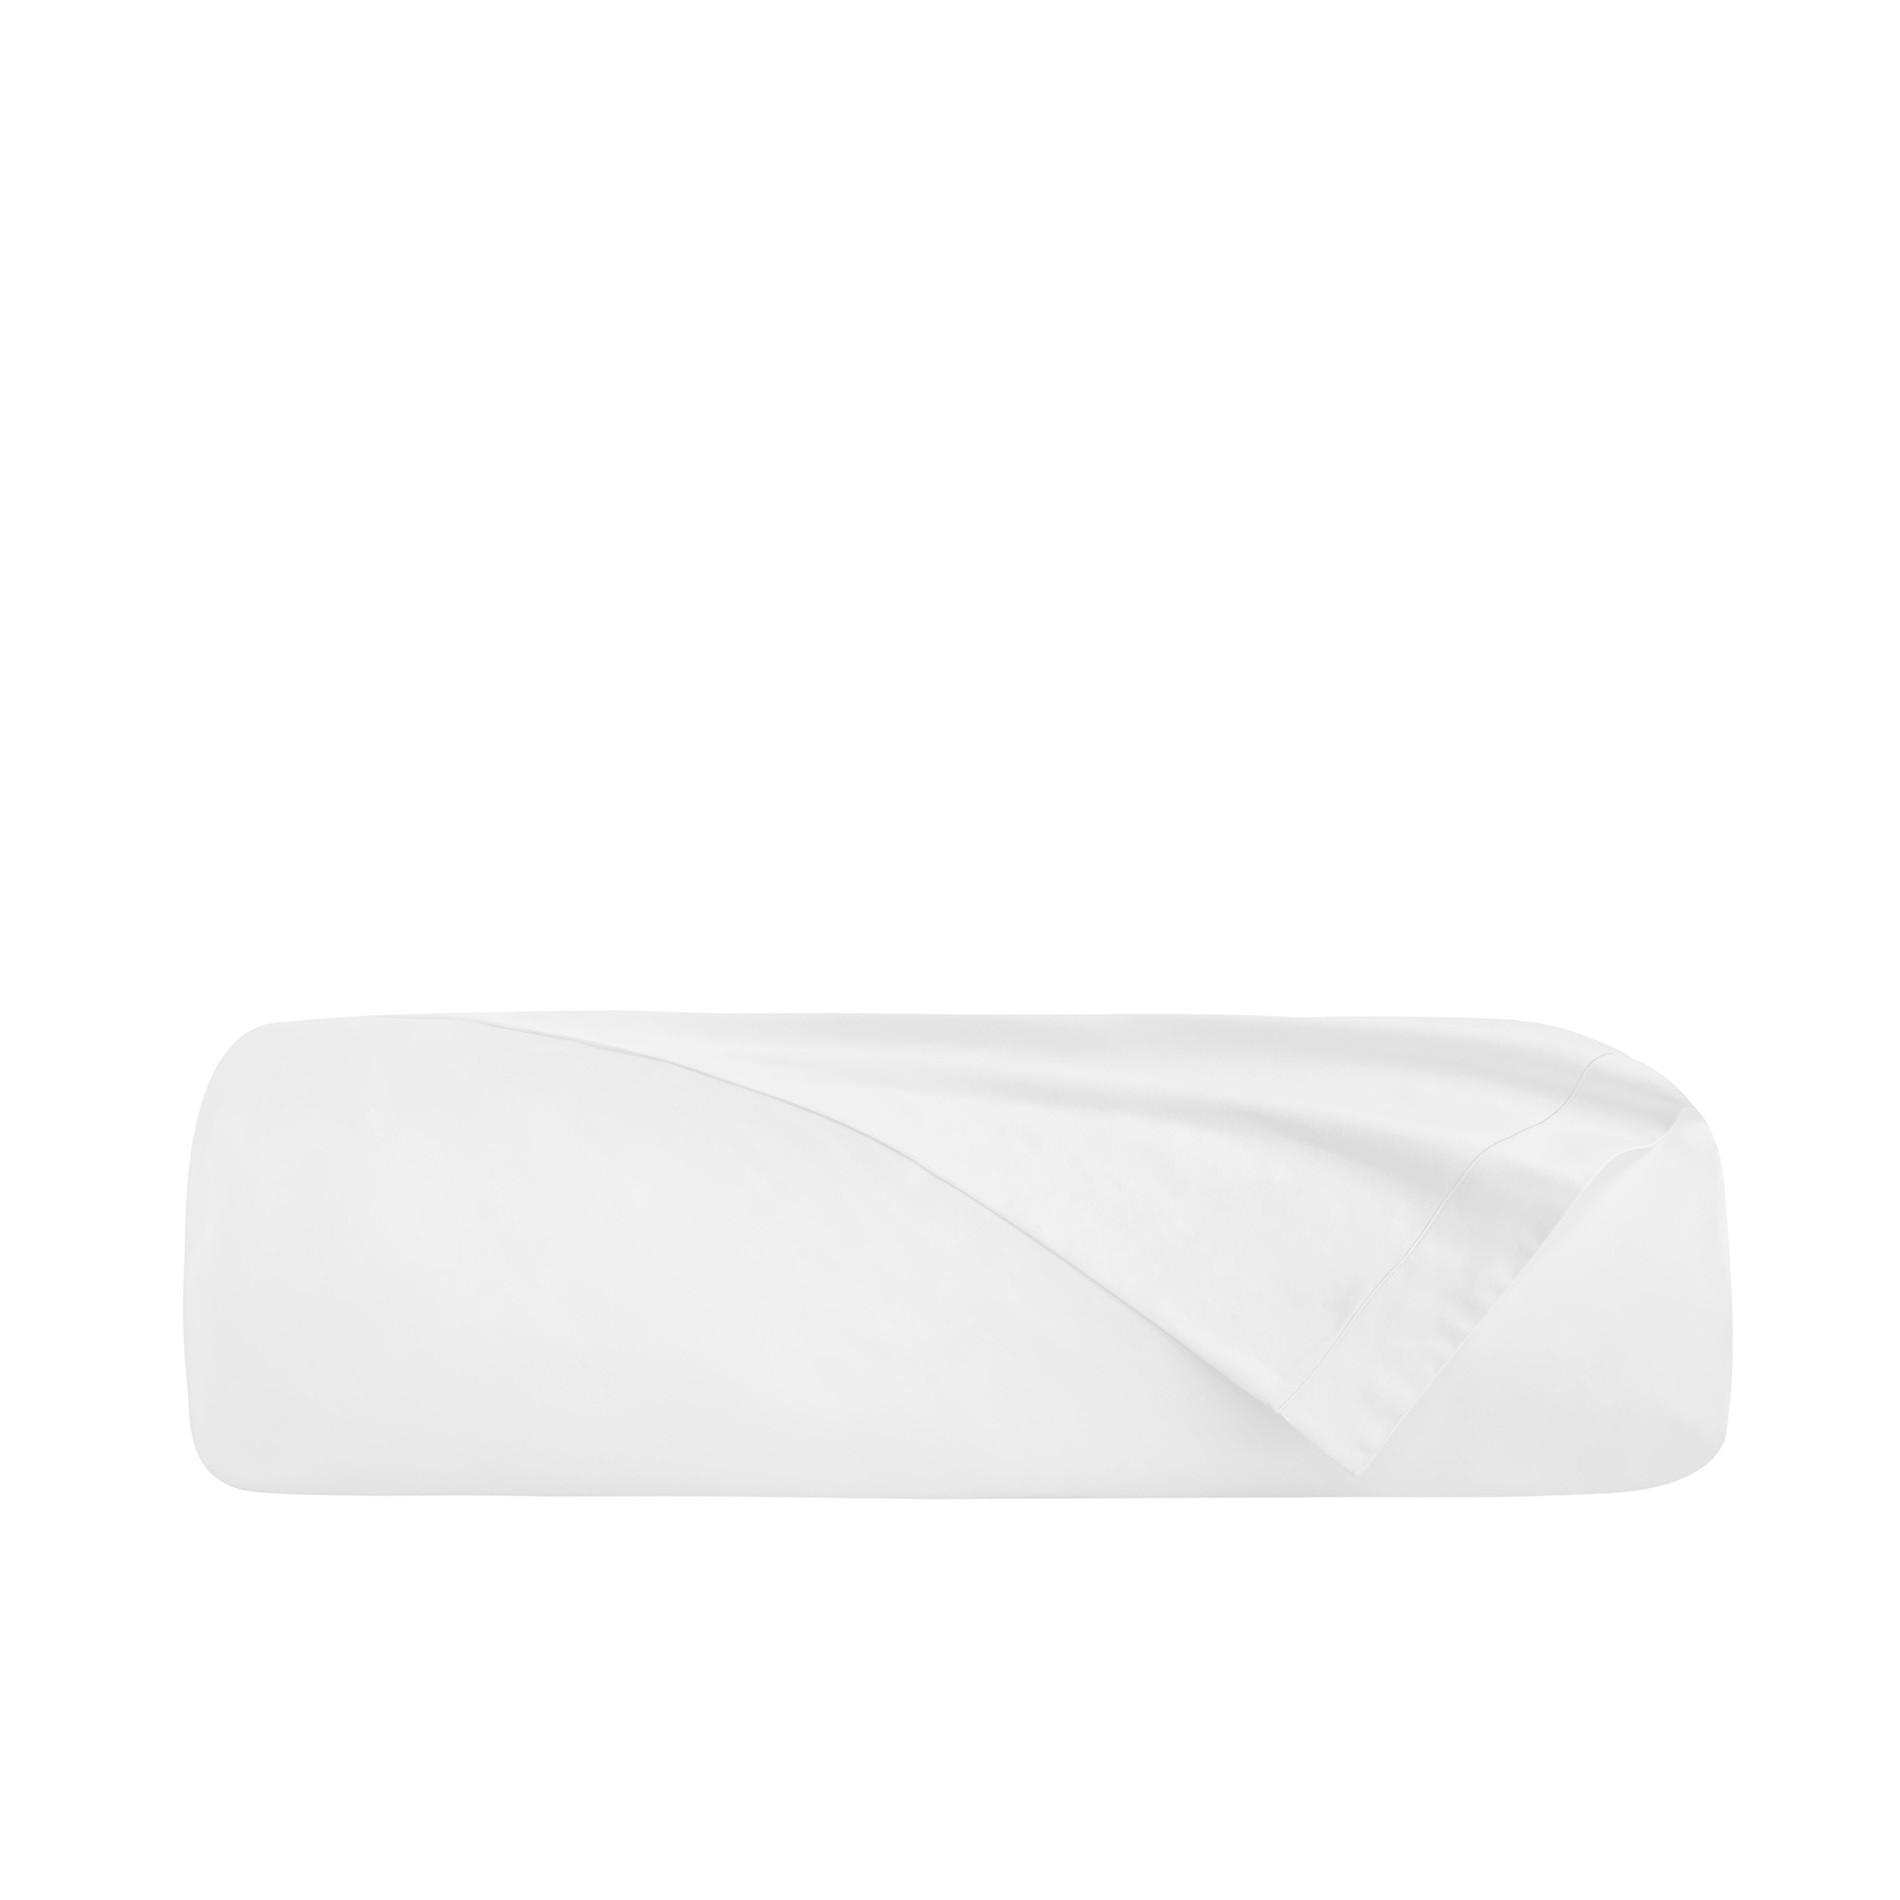 Lenzuolo liscio raso alta qualità Interno 11, Bianco, large image number 3